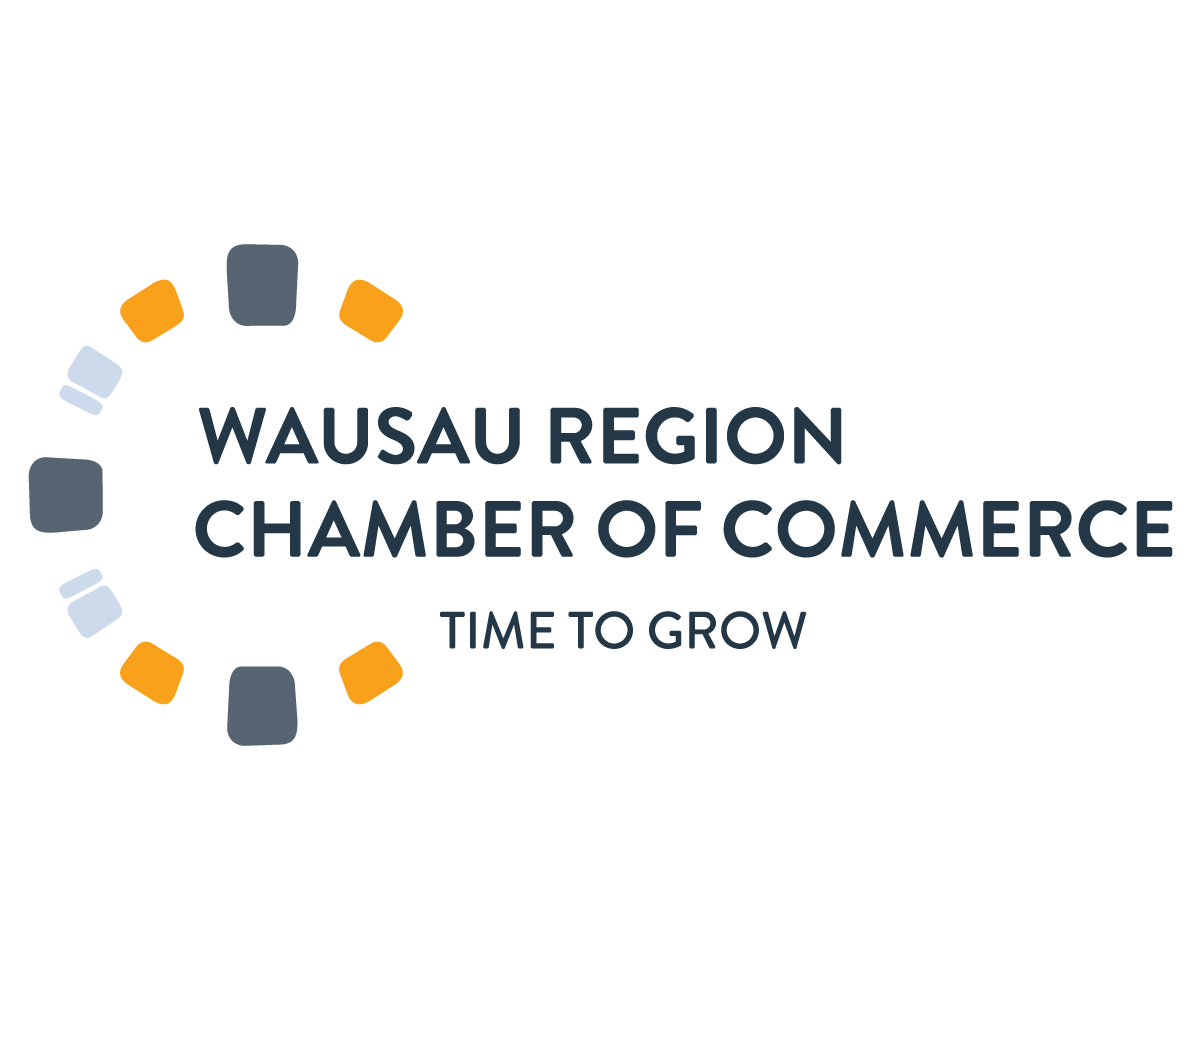 Wausau Region Chamber of Commerce Logo